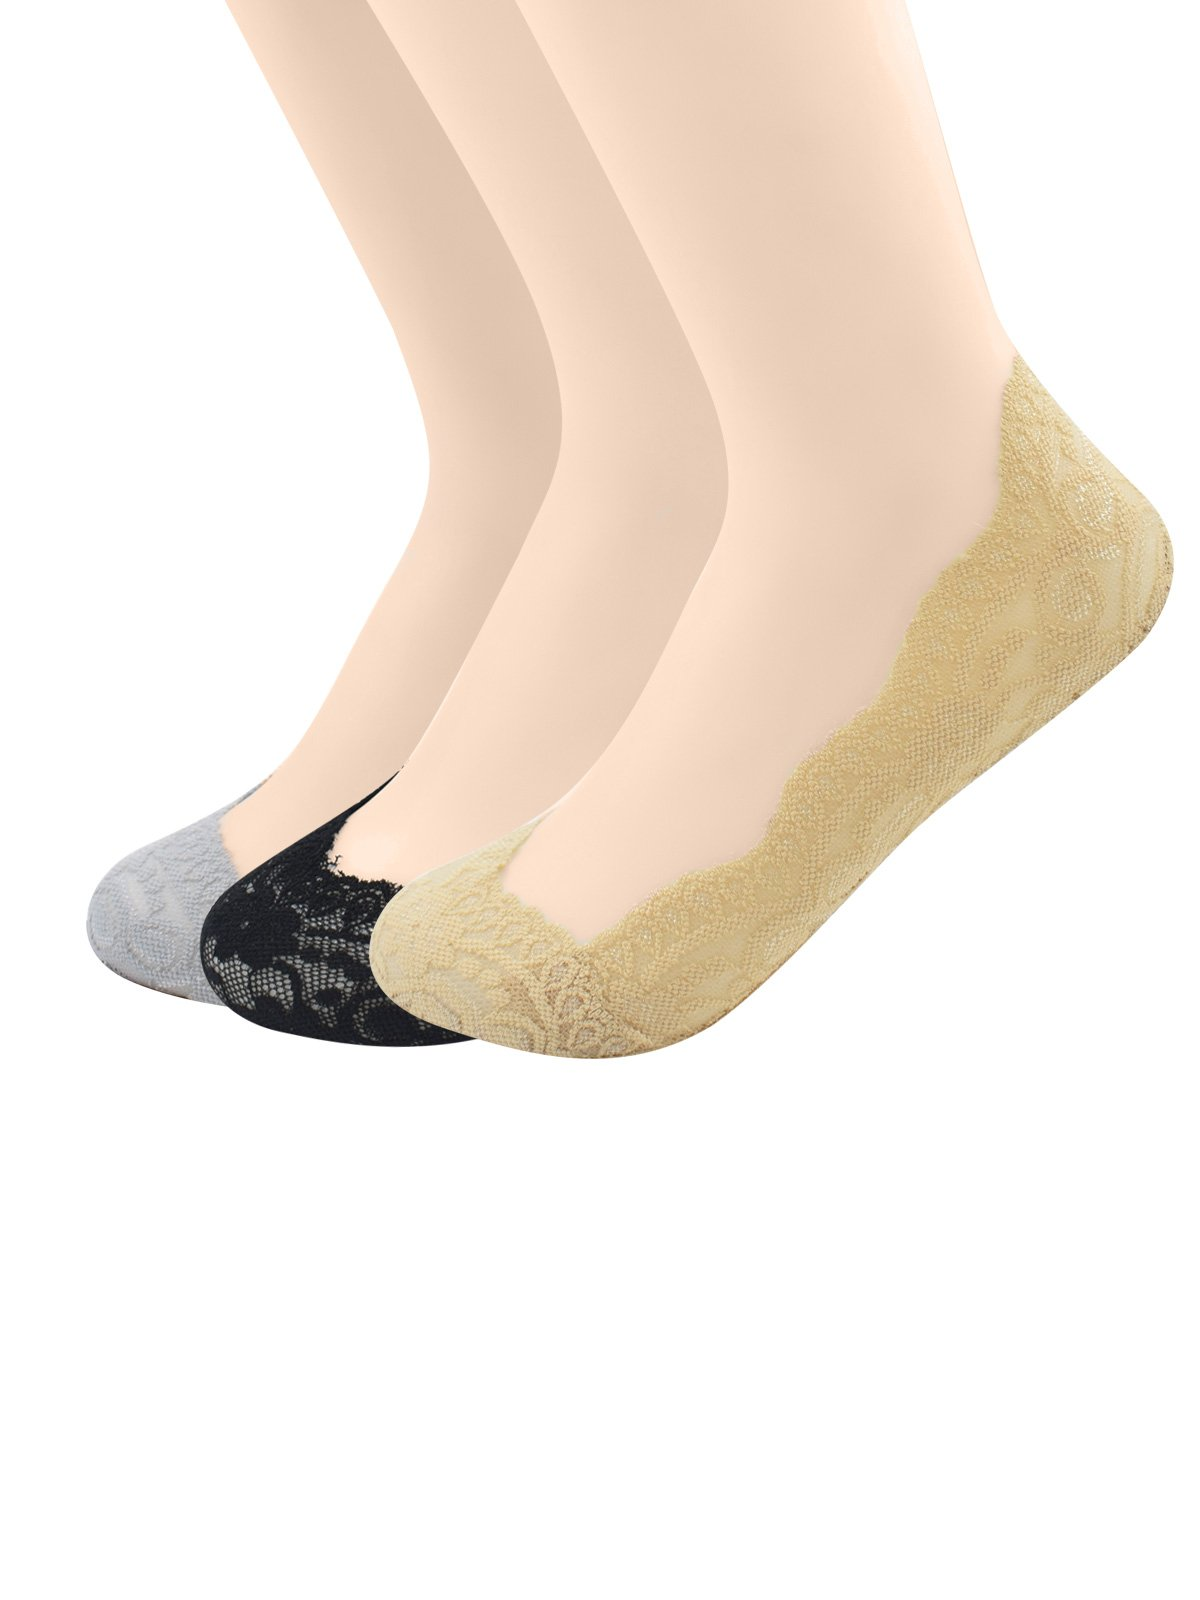 Zando Womens Anti-slip Low Cut Loafer Socks Anti-skidding Lace Hidden No Show Liner Socks F 3 Pairs Grey Black Nude One Size:8.5''-9.5''(Shoe Size:5-8)